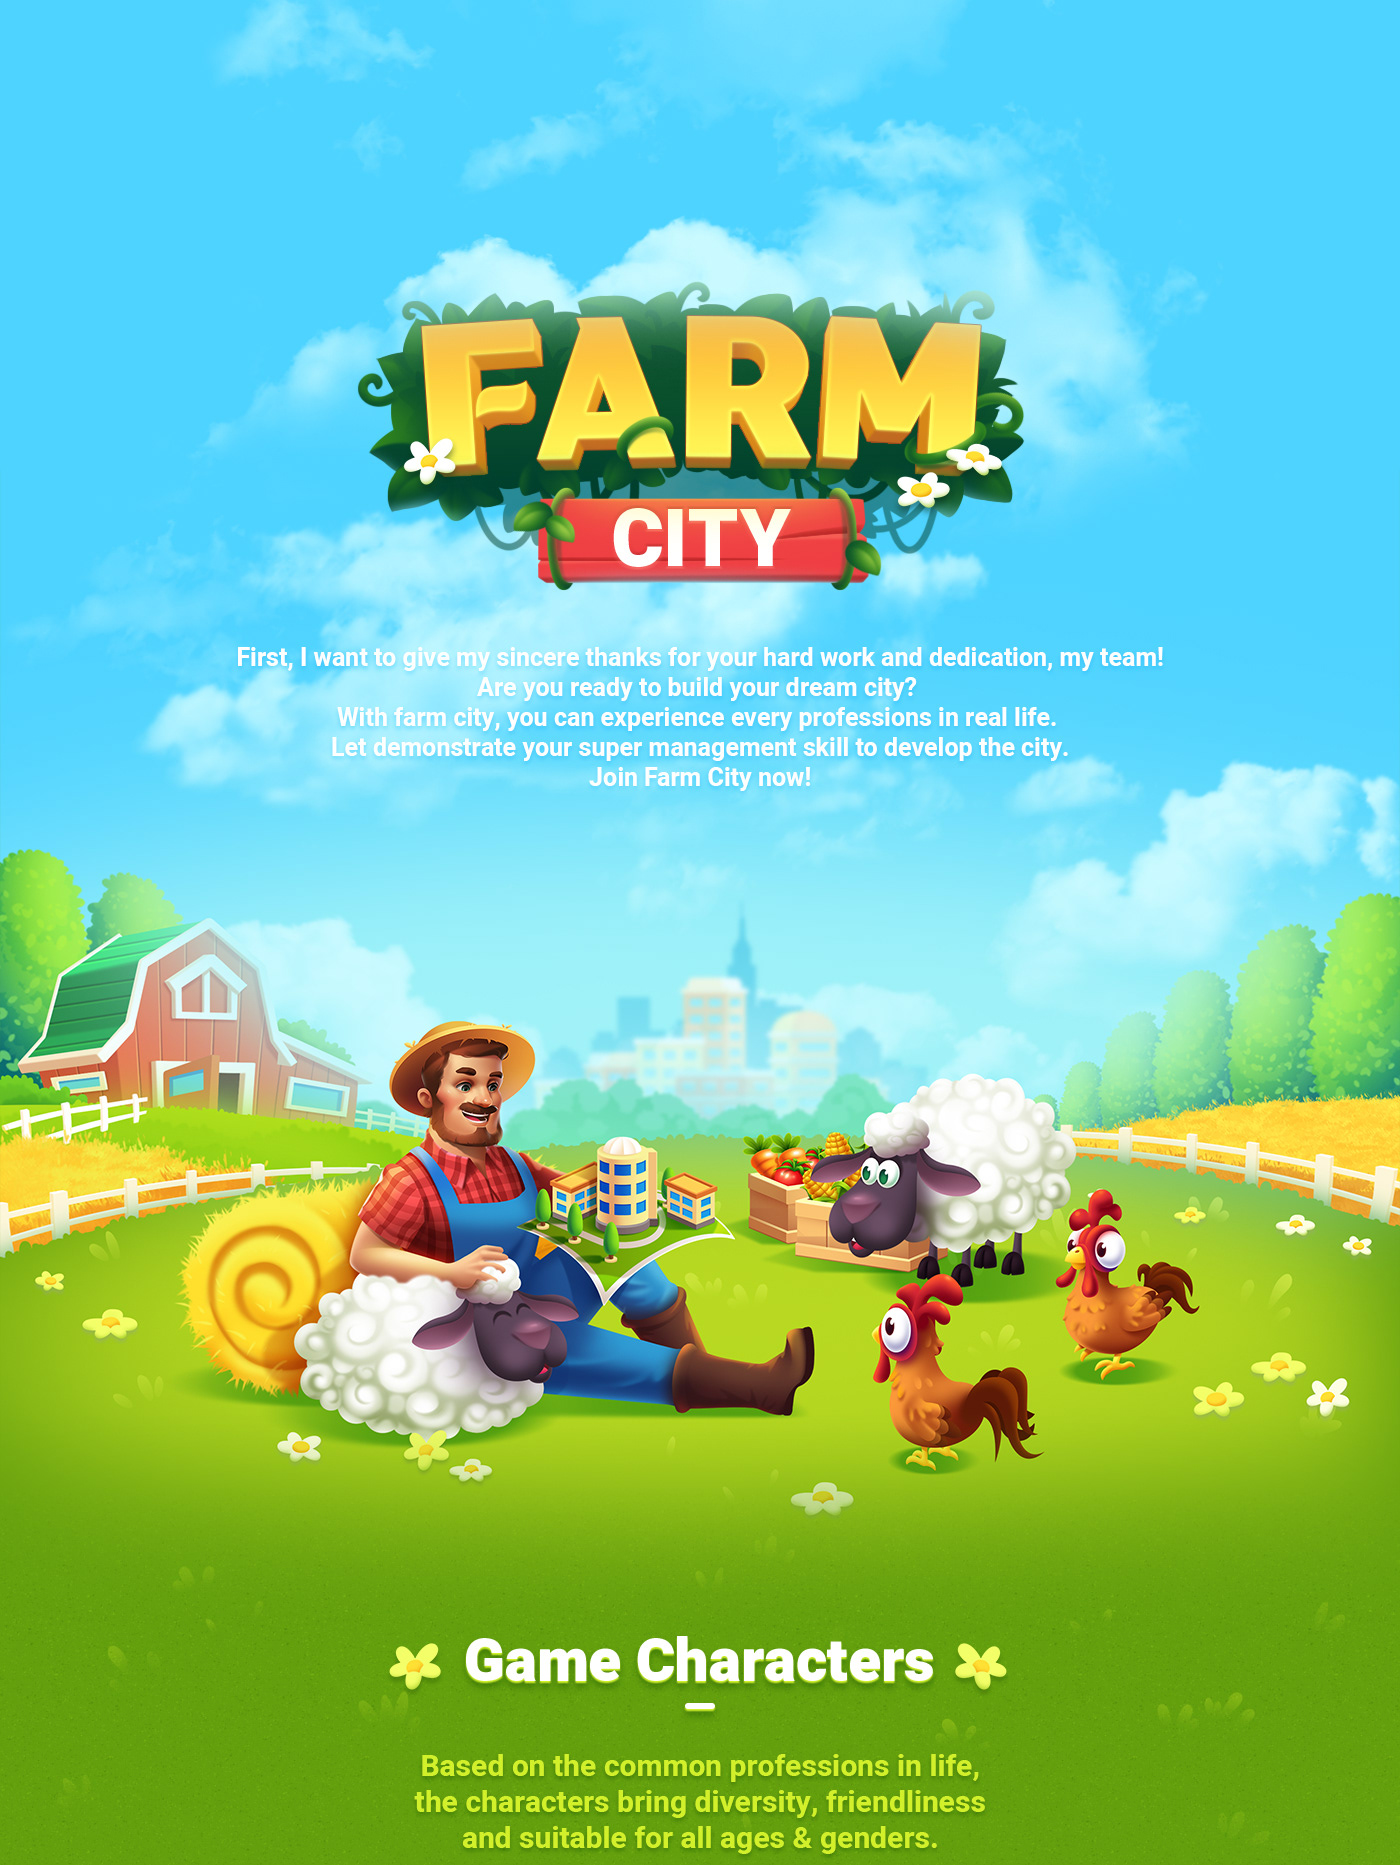 farm city farm game game asset game design  game mobile game ui iKame ILLUSTRATION  Character design  game